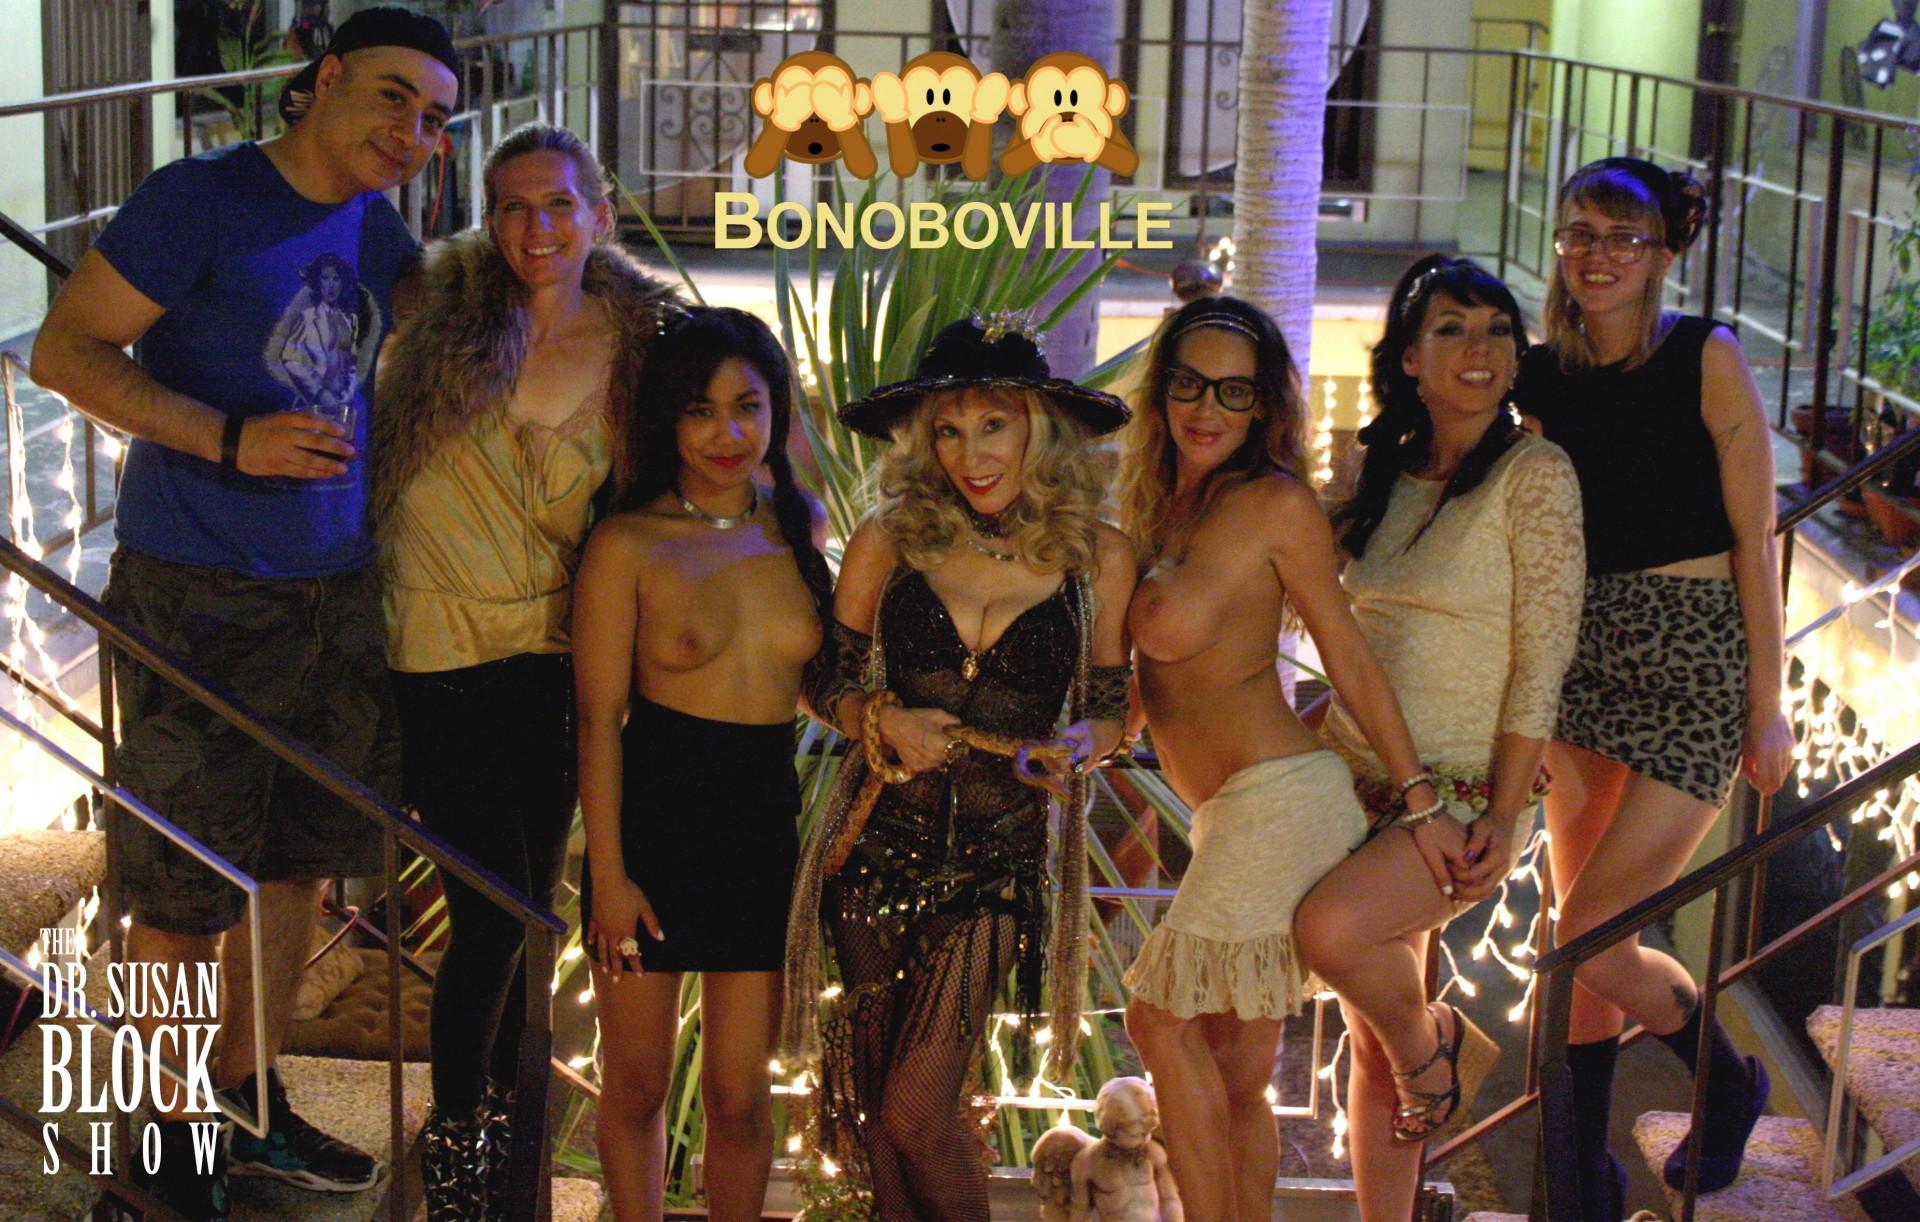 Brock Doom, Tammie Parrot, Loni Legend, Dr. Suzy & Snake Eve, Dayton Rains, Biz Bonobo & Ono Bo in the Garden of Bonoboville. Photo: Unscene Abe